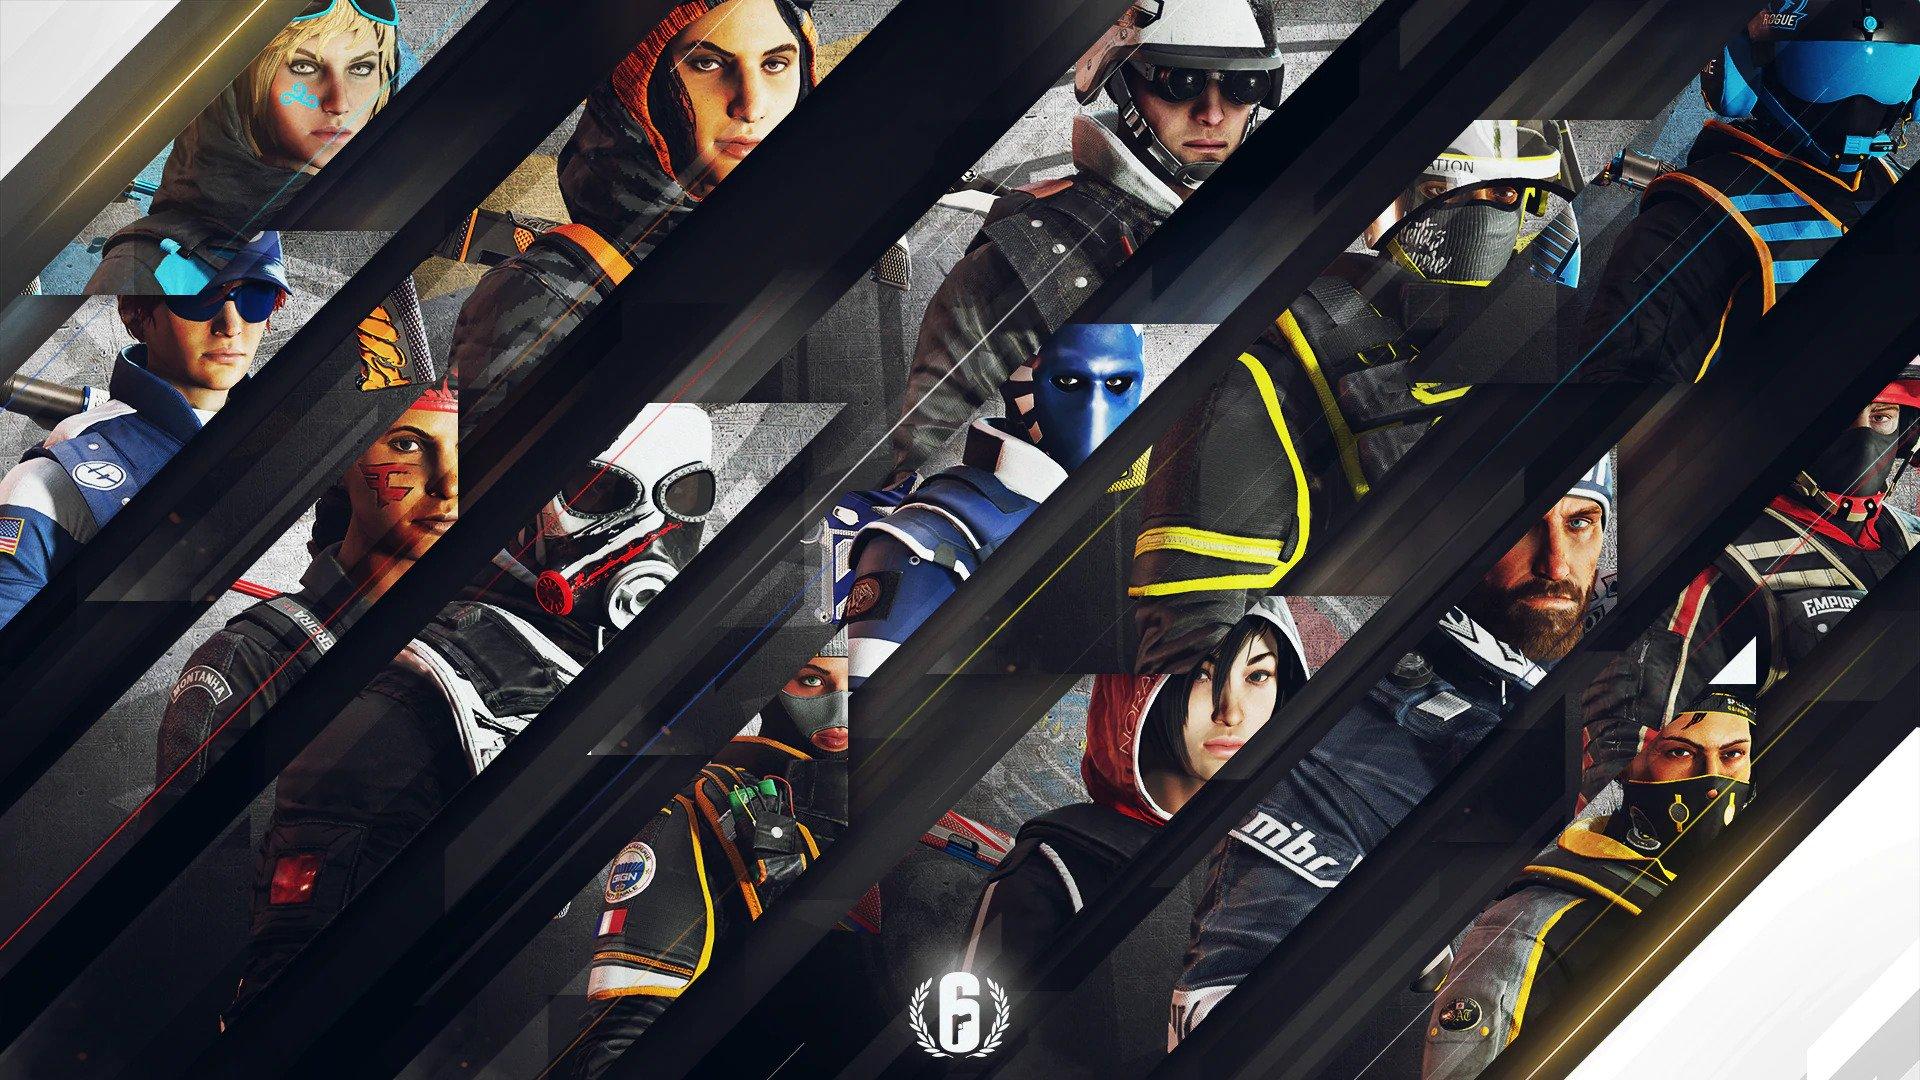 Rainbow Six Siege adds 14 teams to esports Pilot Program